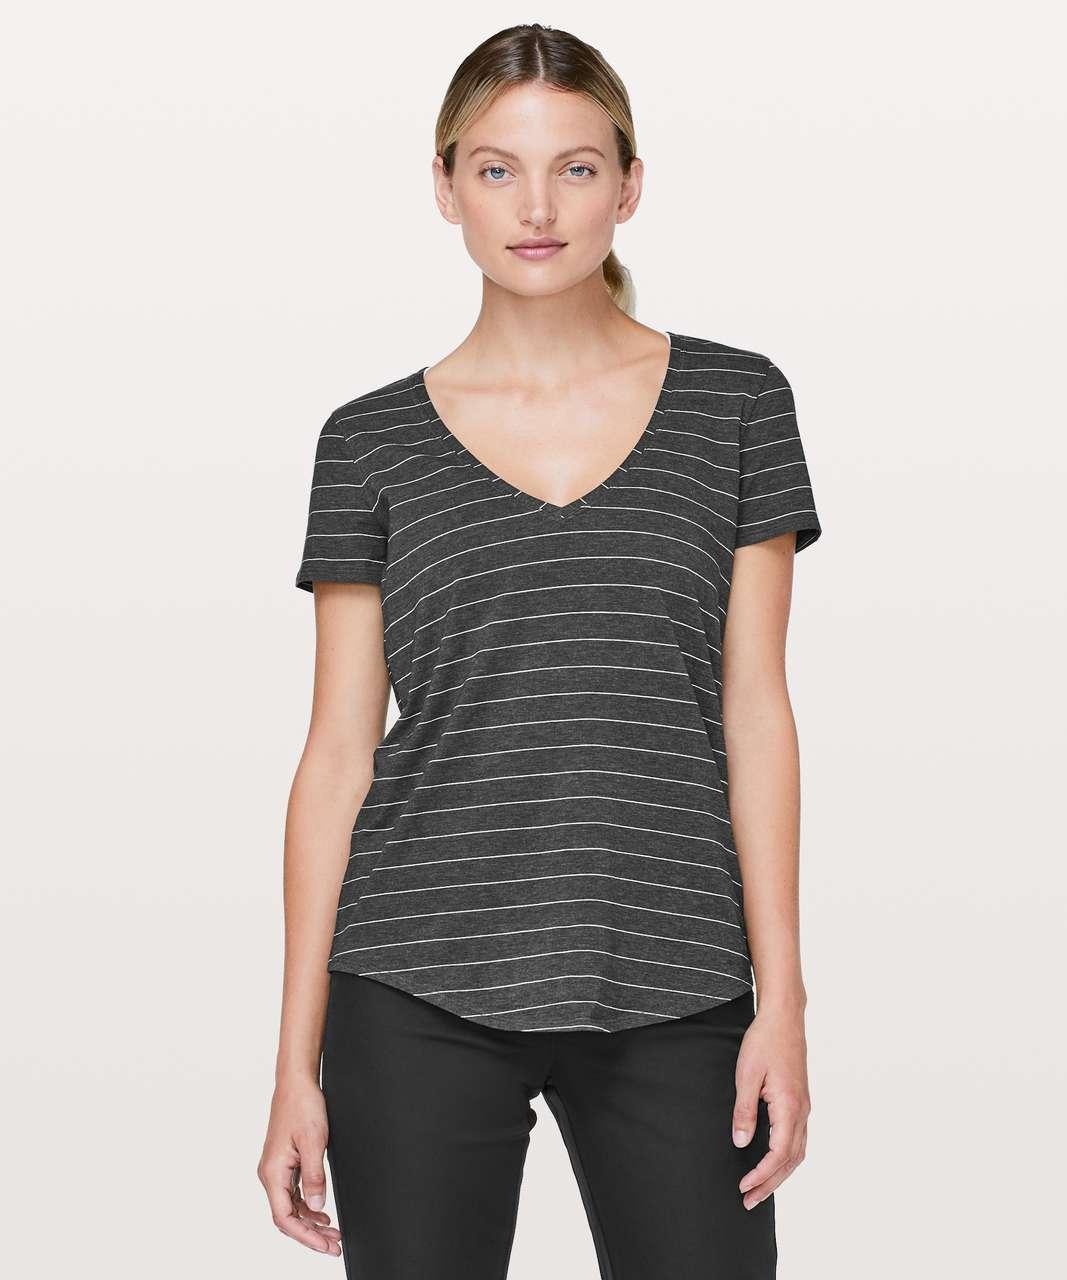 Lululemon Love Tee V - Short Serve Stripe Heathered Black White